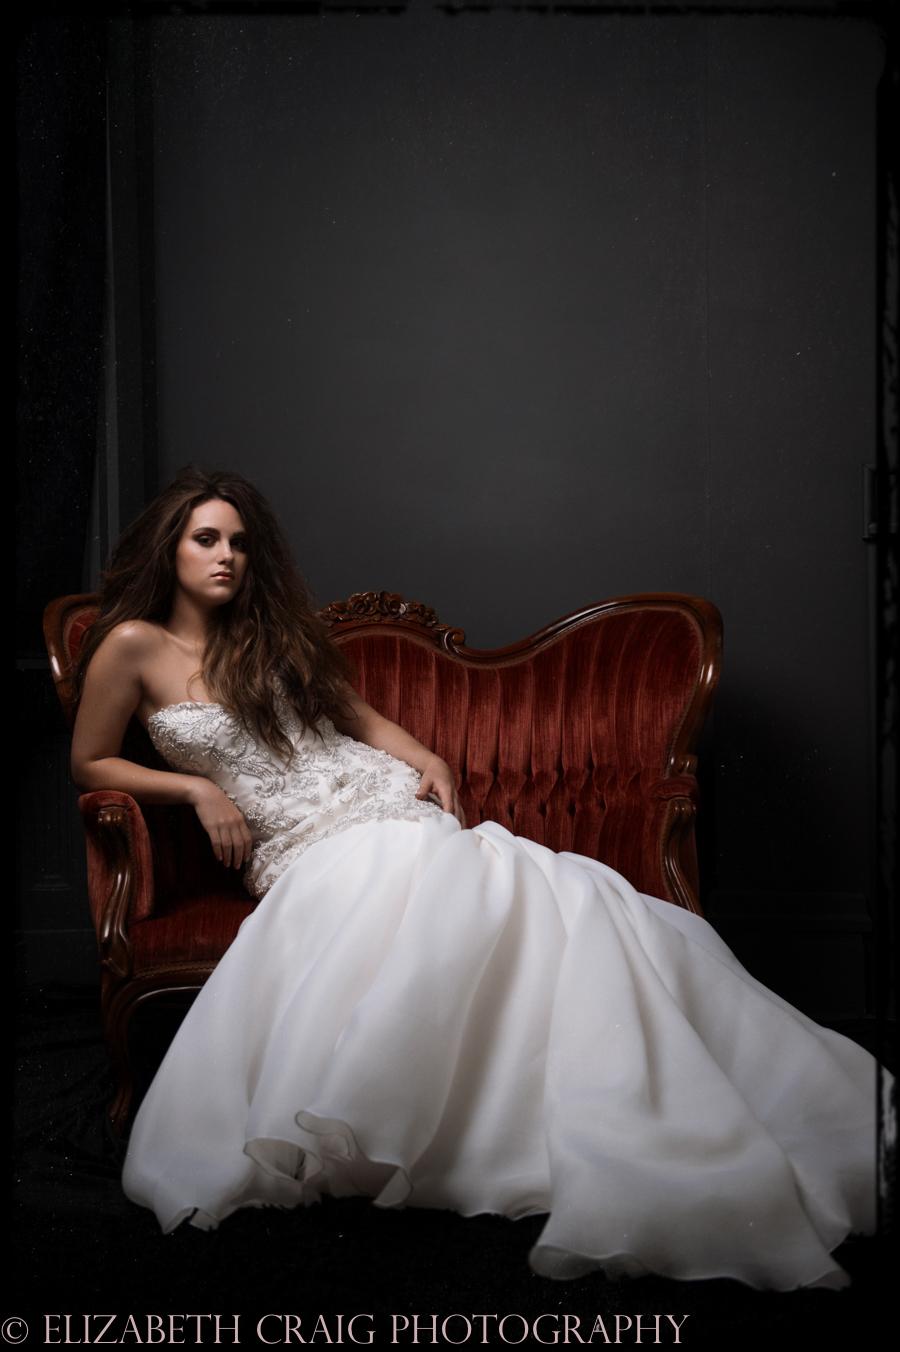 pittsburgh-boudoir-photographer-pittsburgh-wedding-photographer-elizabeth-craig-photography-002